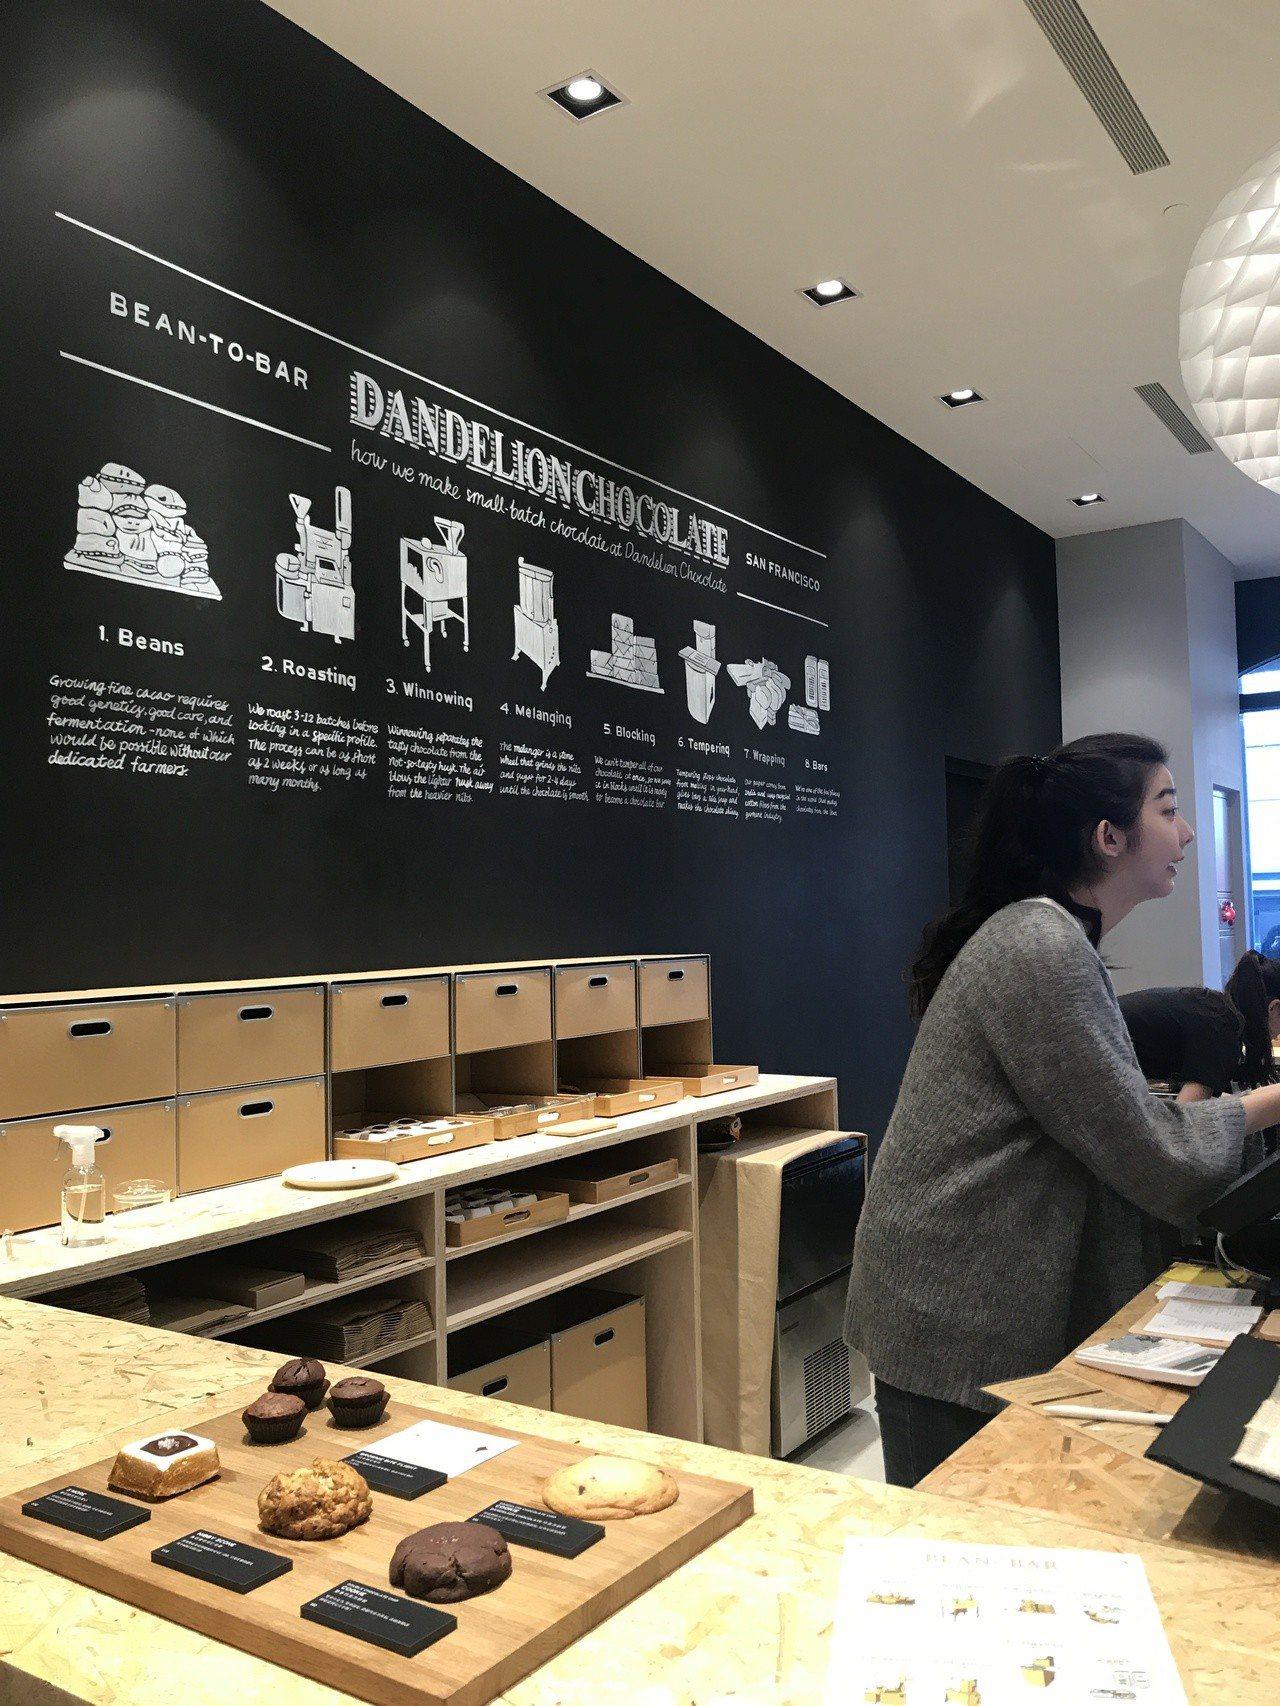 Dandelion Chocolate櫃檯陳列供應的巧克力點心,讓消費者選擇。記...